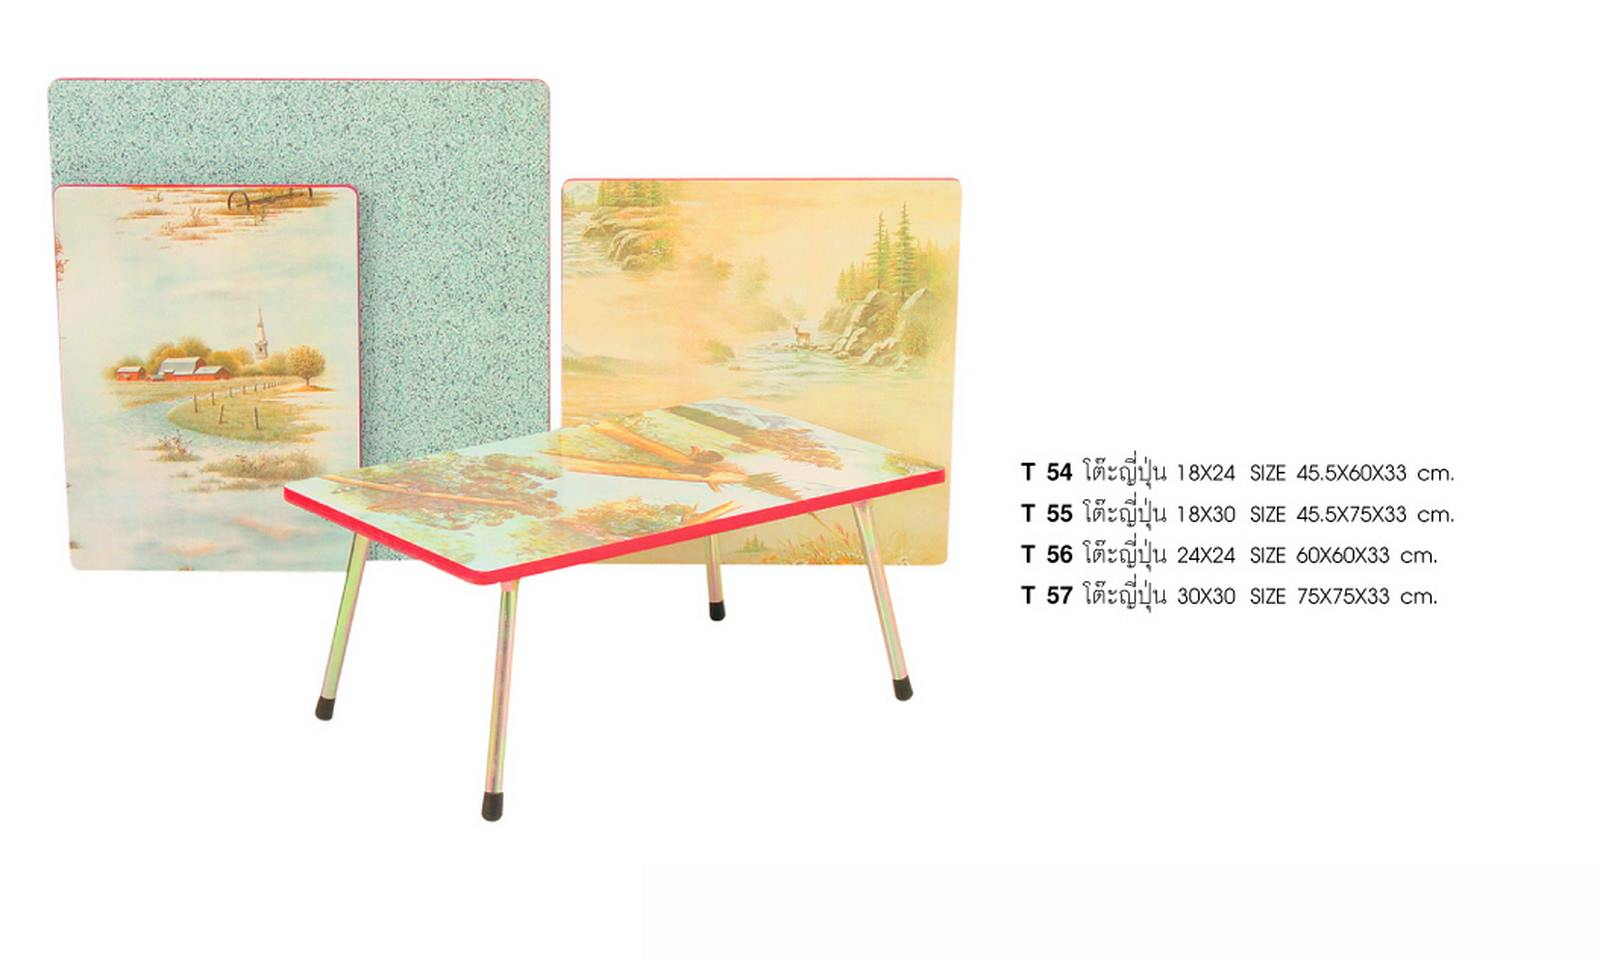 PMY24-9 โต๊ะญี่ปุ่น